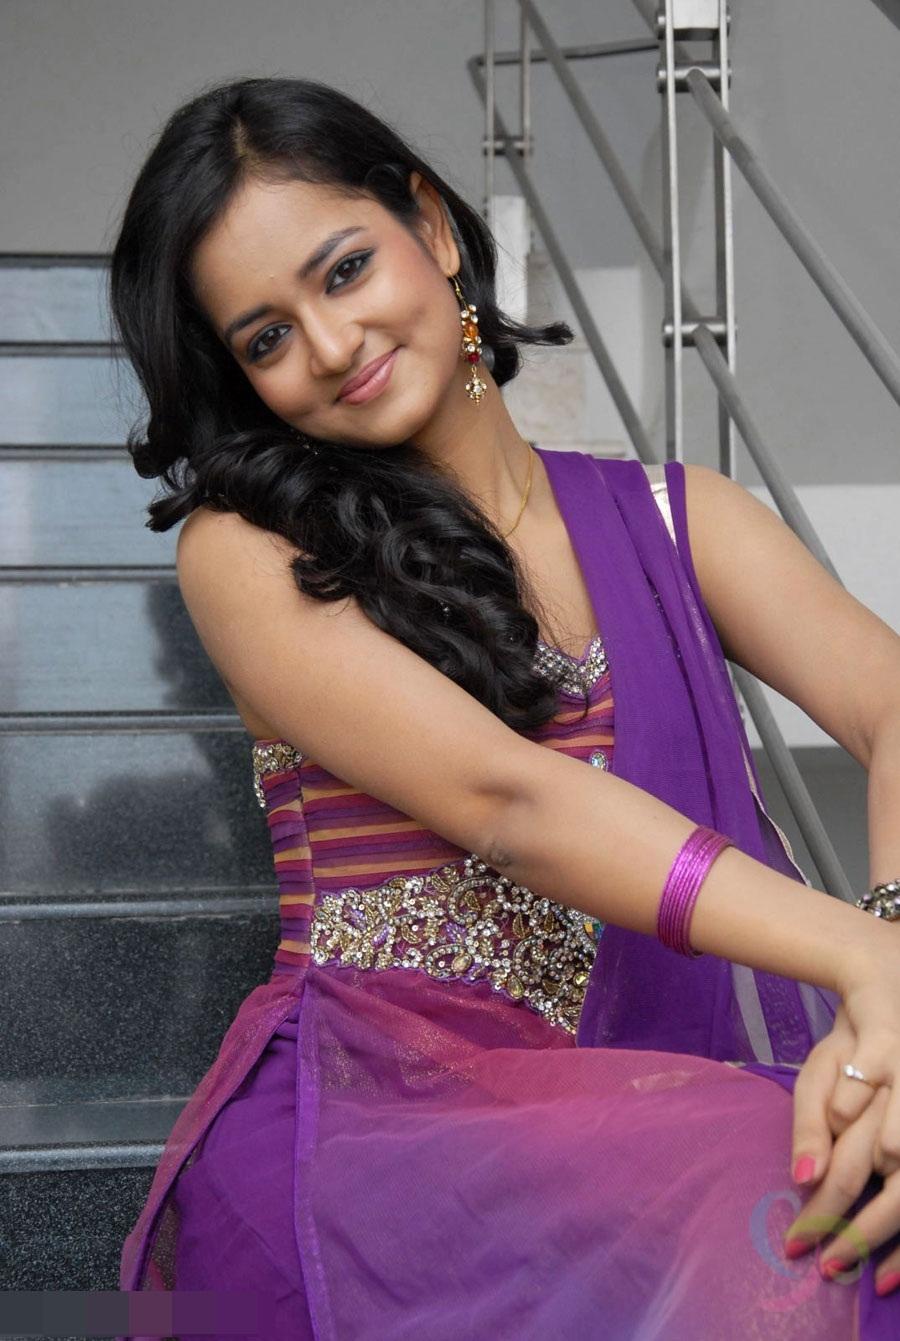 Beautiful Indian Girl pics, Desi Girls pics, Cute Indian ...